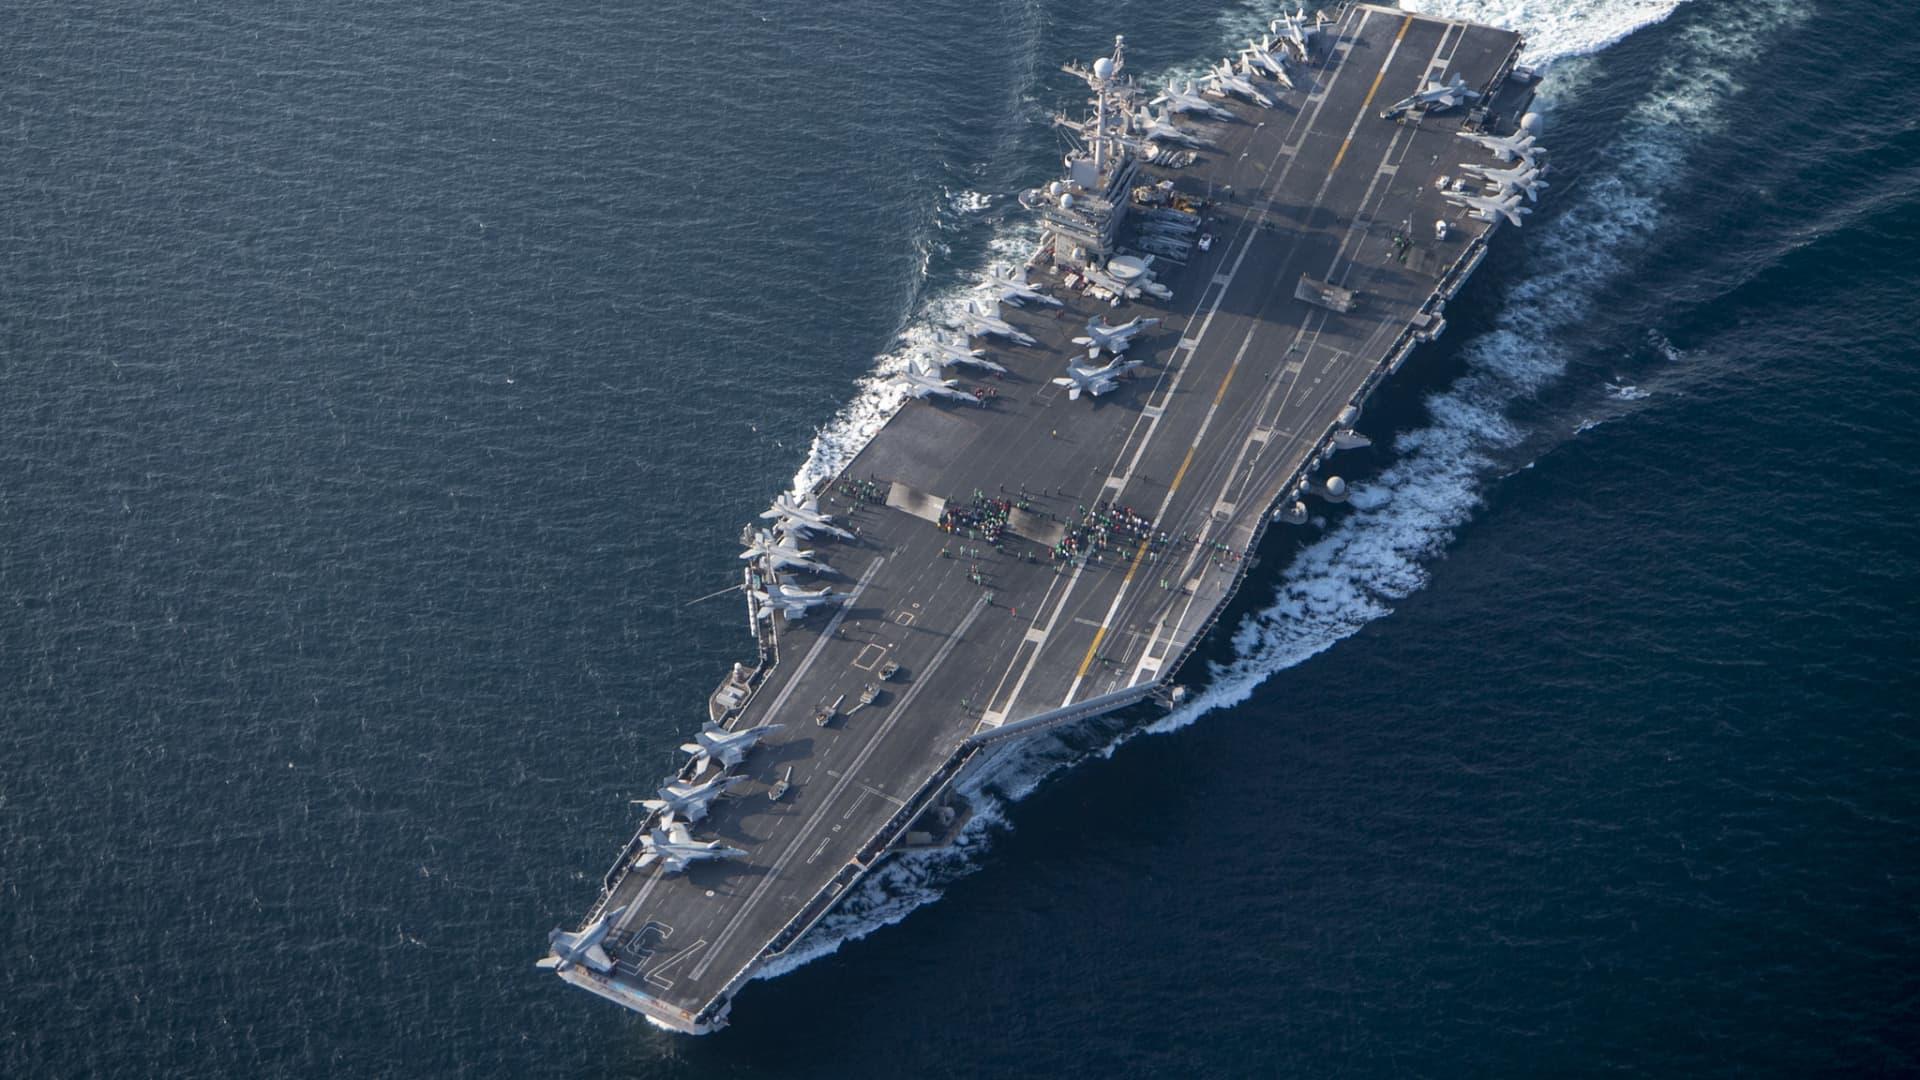 The aircraft carrier USS Harry Truman transits the Arabian Sea, Jan. 31, 2020.